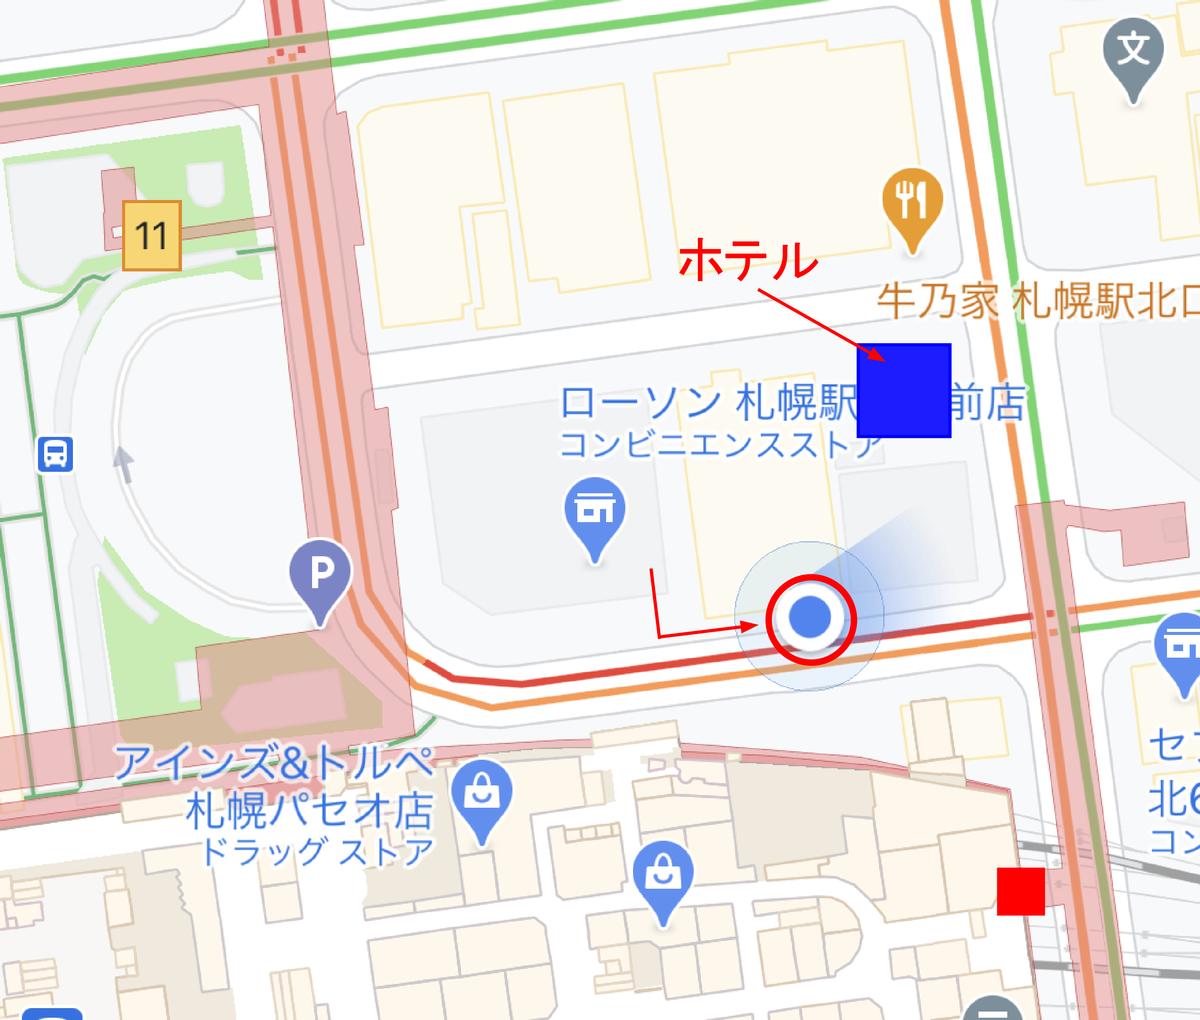 f:id:Nagoya1976:20200830170439p:plain